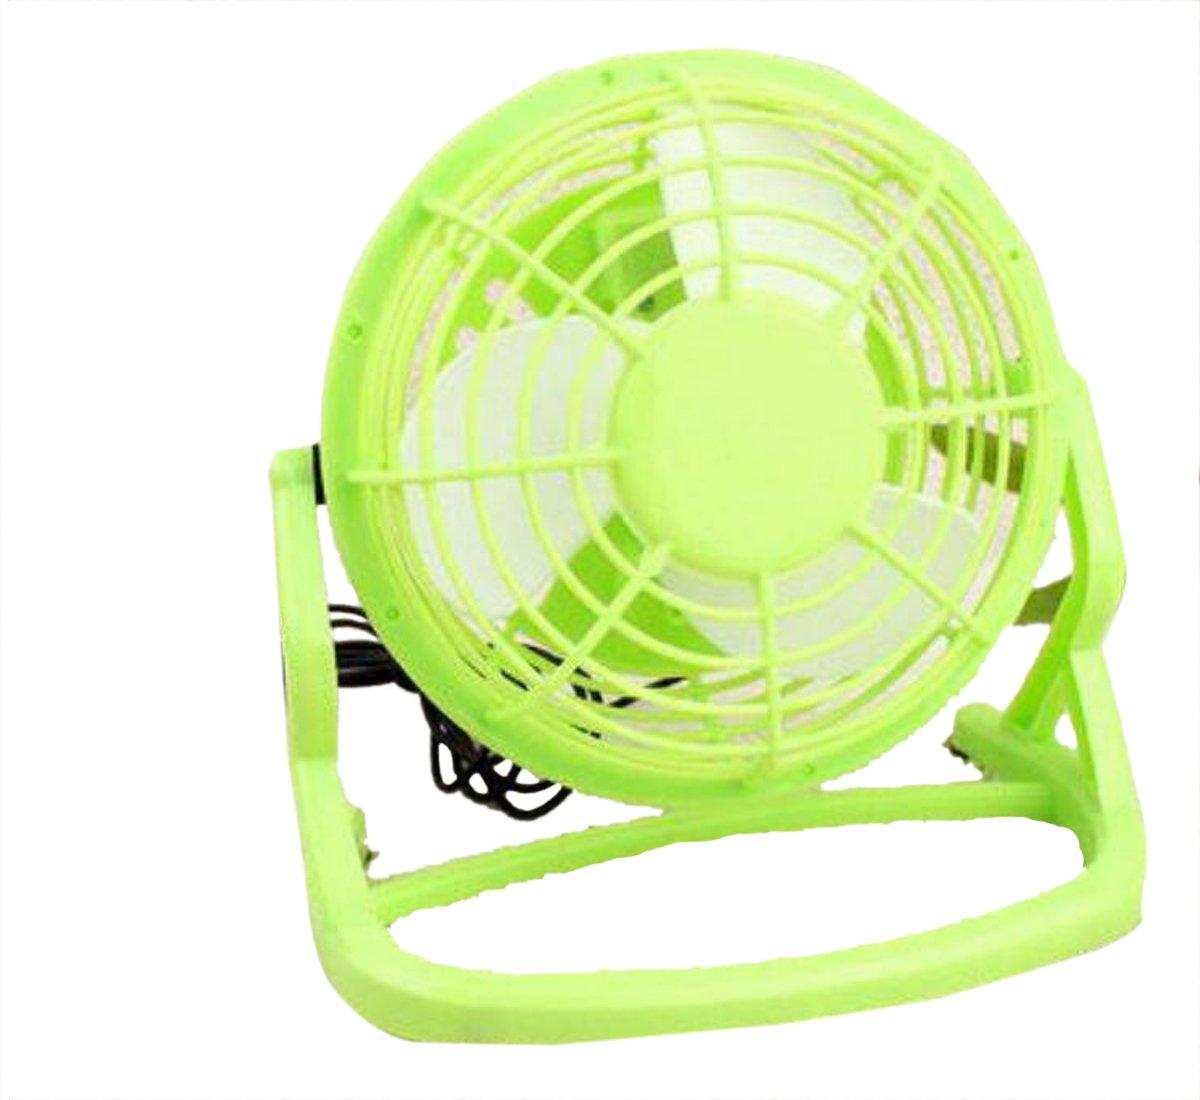 Sweatwater Portable Table Office 4 inch Desktop Home Mini USB School 360 Degree Rotation Fan Green One-Size